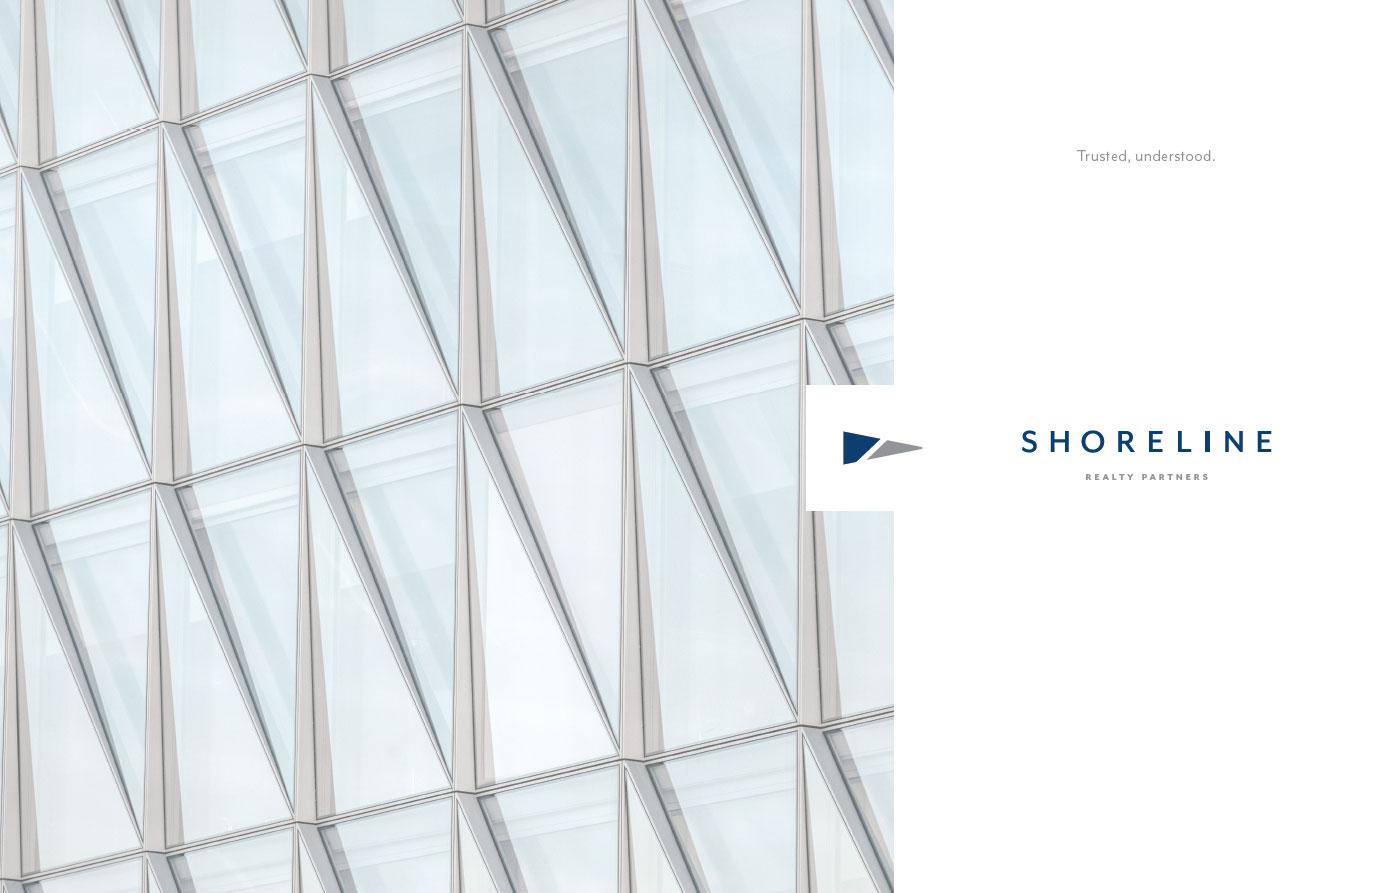 Shoreline Realty Partners Branding and Identity